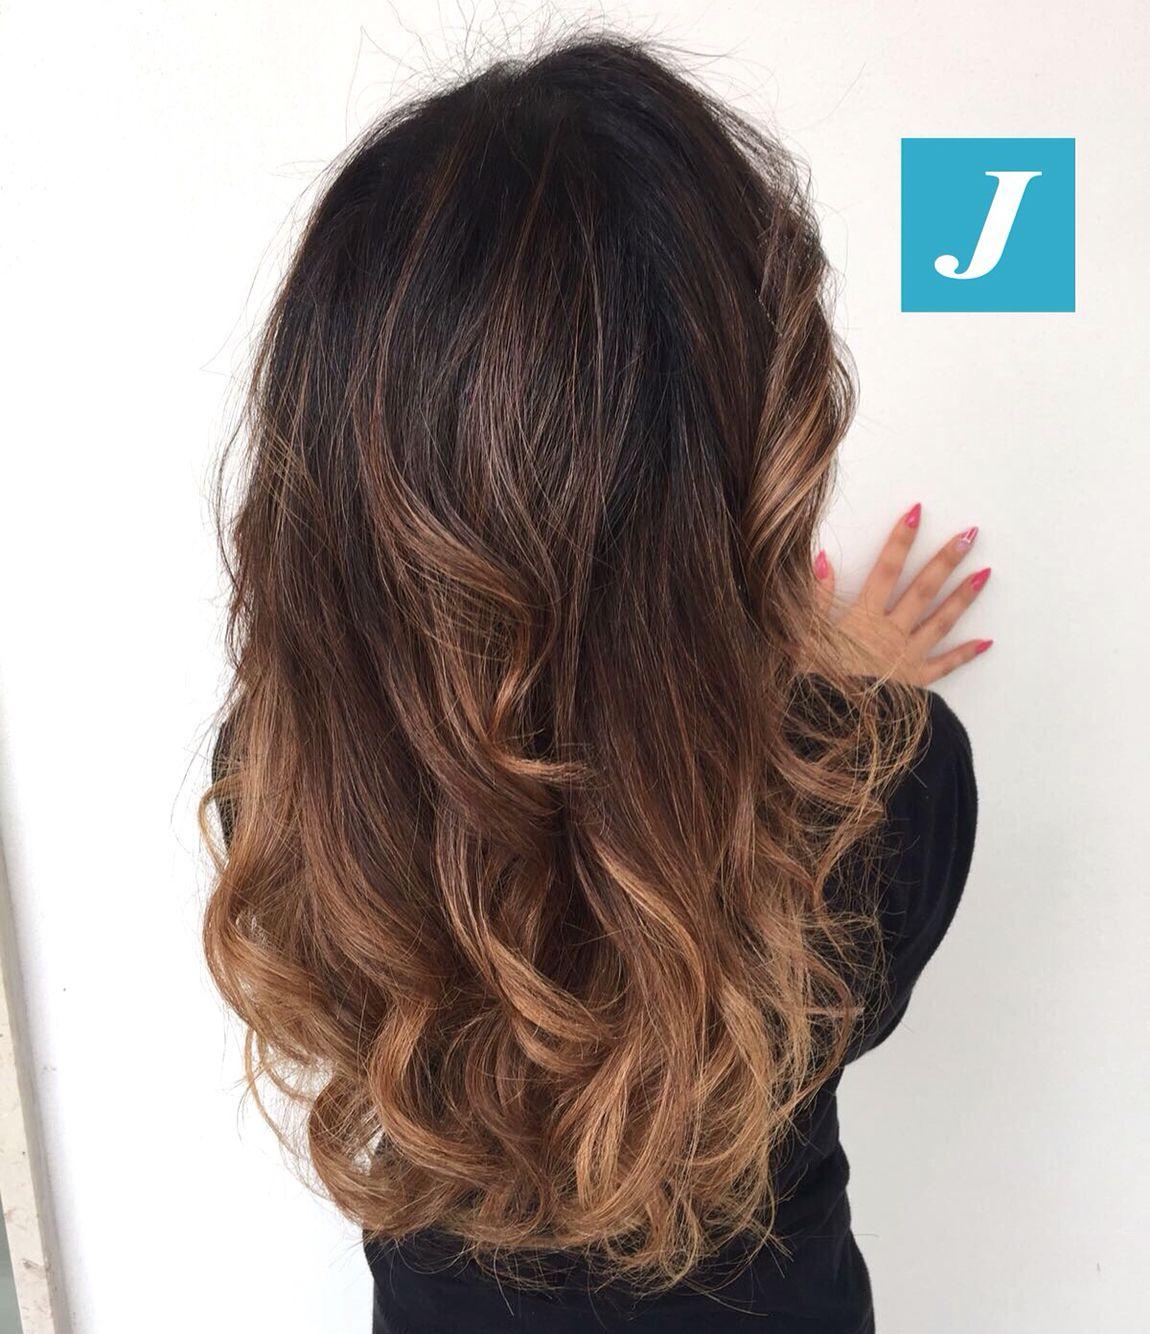 Degrade Joelle L Essenza Della Femminilita Cdj Degradejoelle Tagliopuntearia Degrade Igers Musthave Hair Hairstyl Coiffure Cheveux Idees De Coiffures